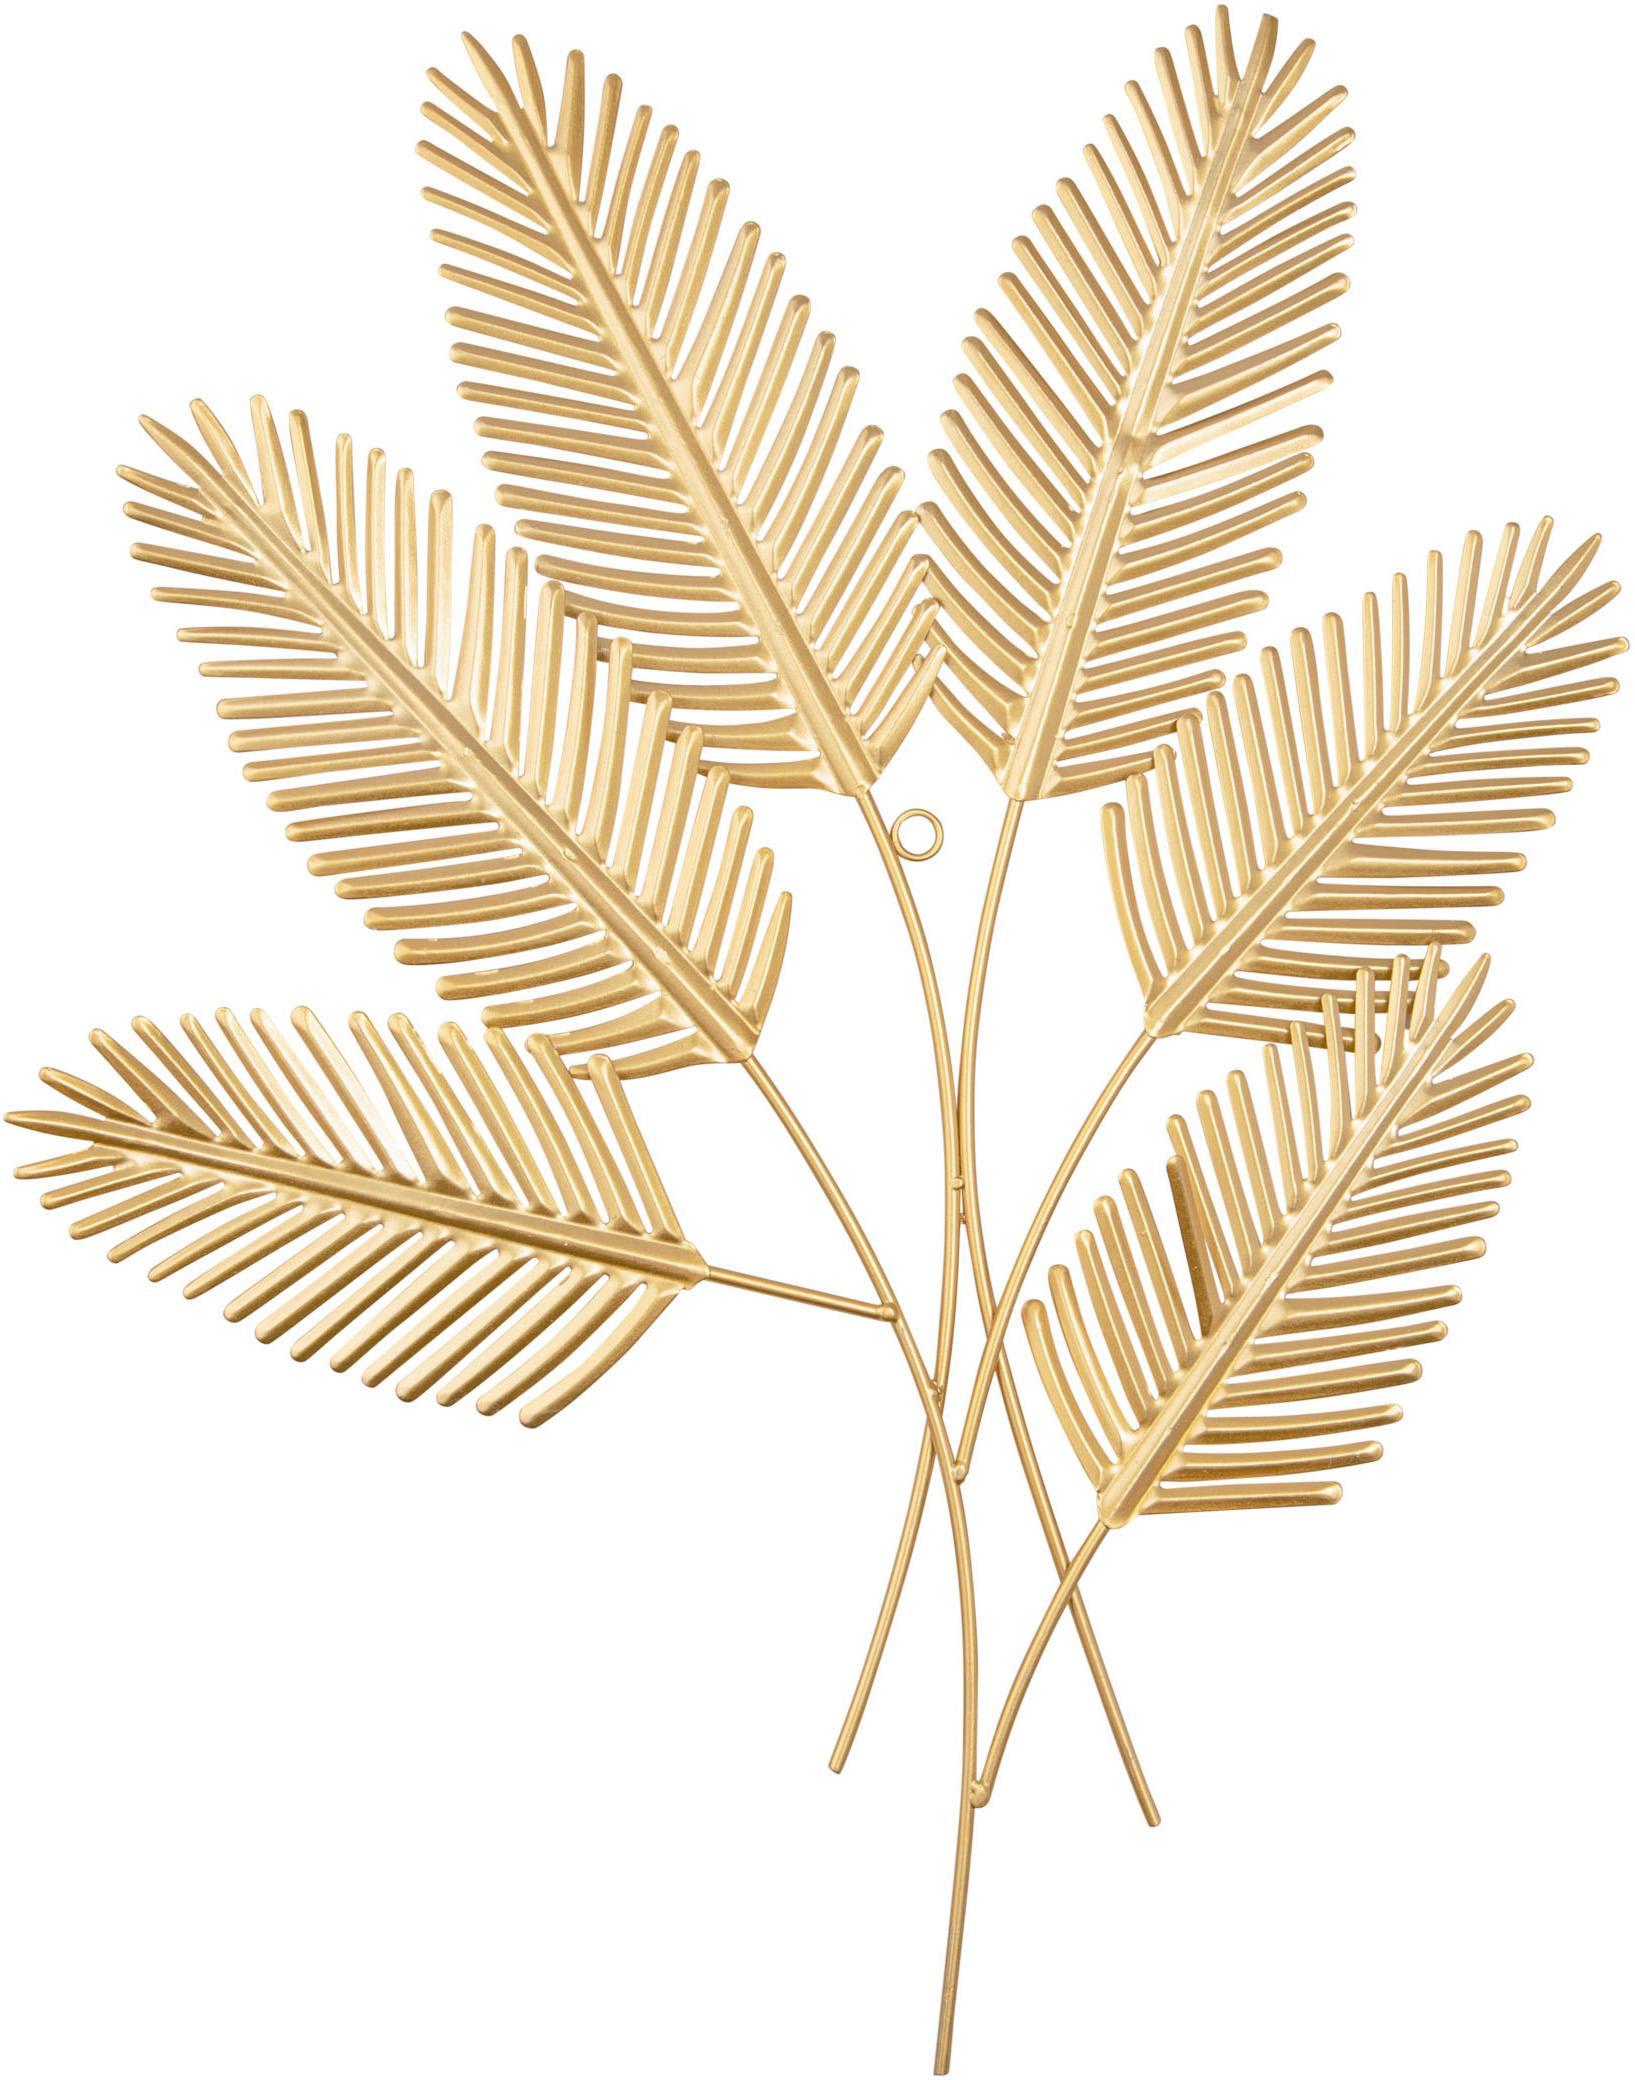 Wandobject Beech Leaves, Gecoat metaal, Messingkleurig, 48 x 62 cm